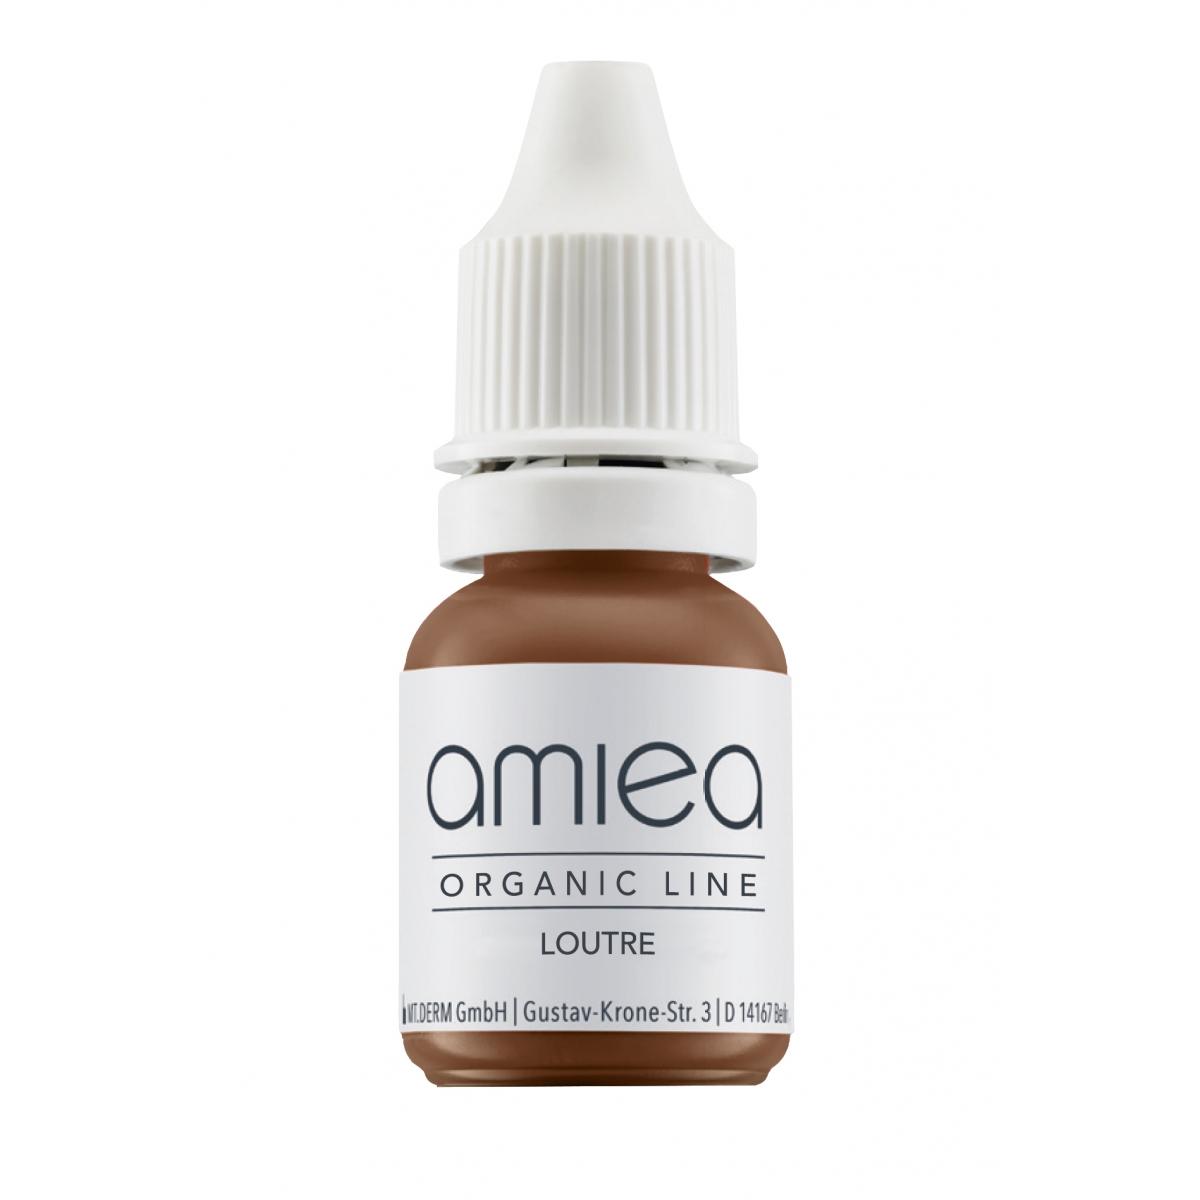 ORGANIC LINE (10ml) - PIGMENT LOUTRE ORGANICLINE AMIEA (10 ml)